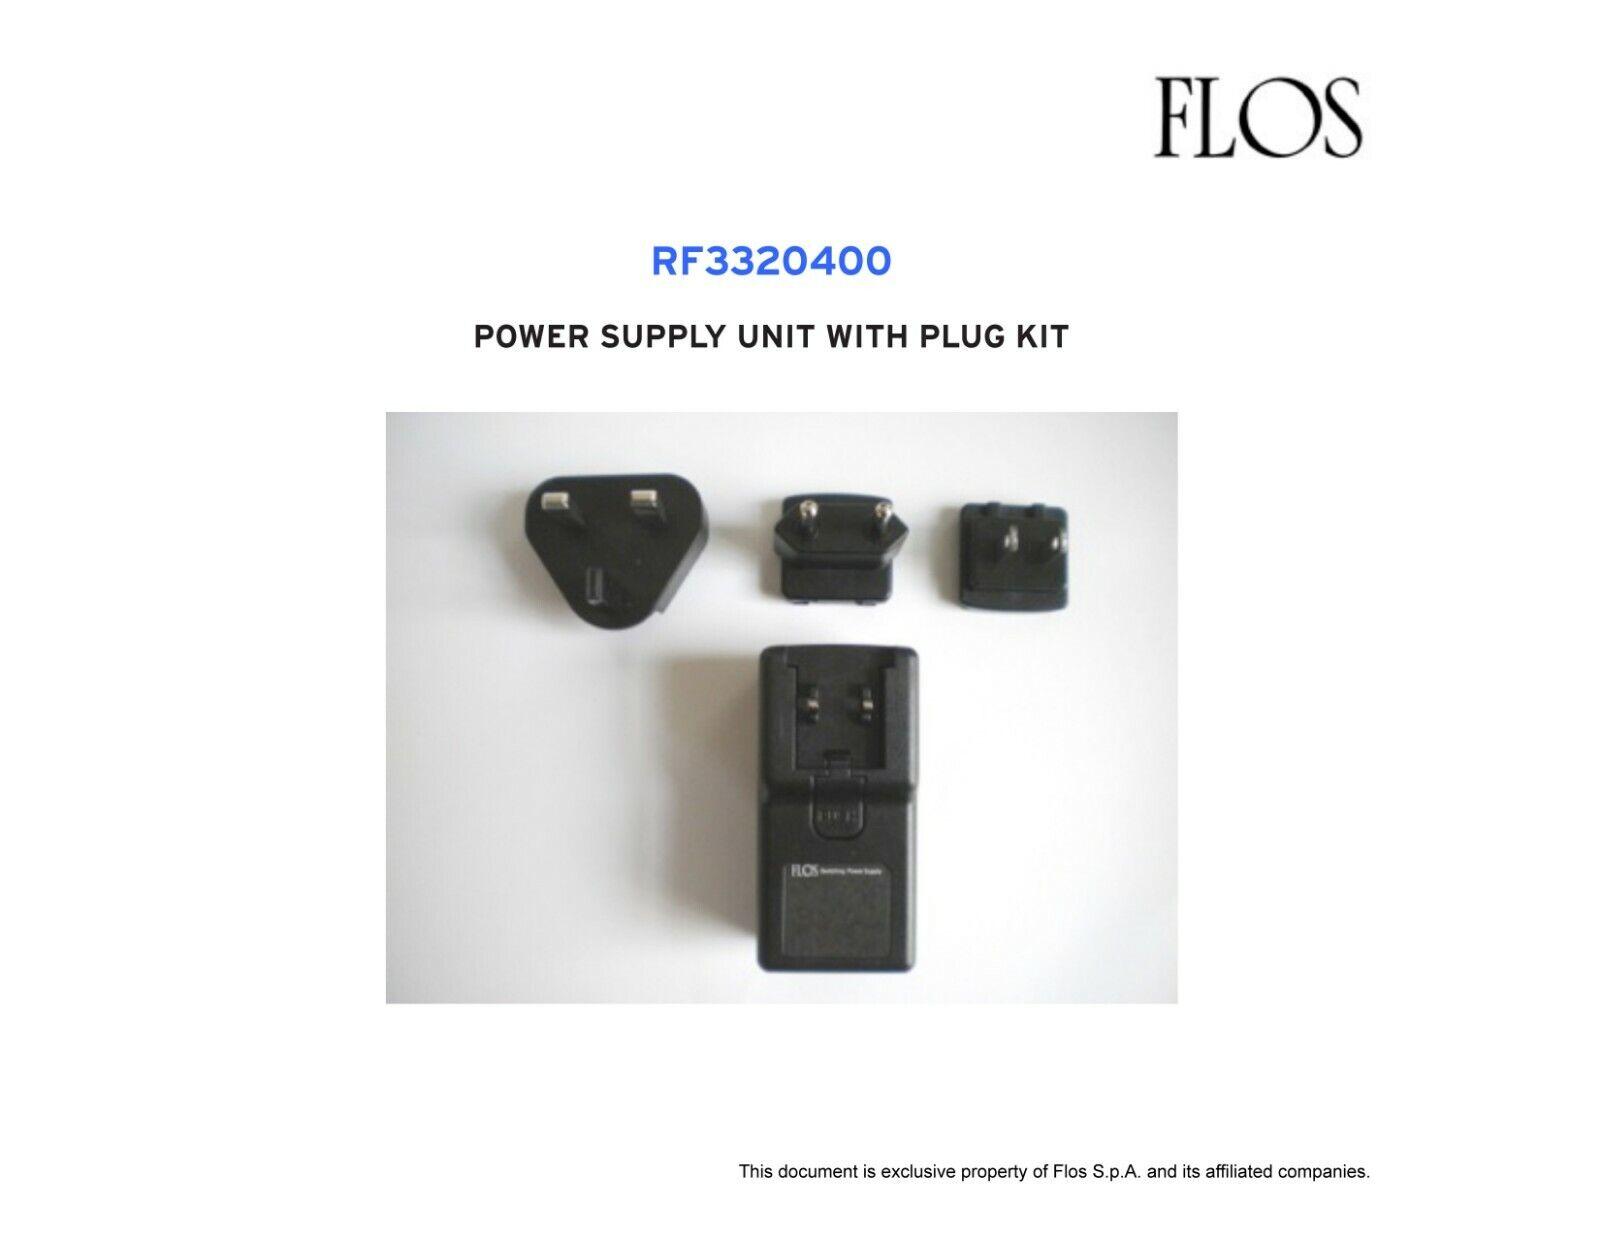 FLOS ARCO LED - RF3320400 - POWER SUPPLY UNIT WITH PLUG KIT - BRAND NEW